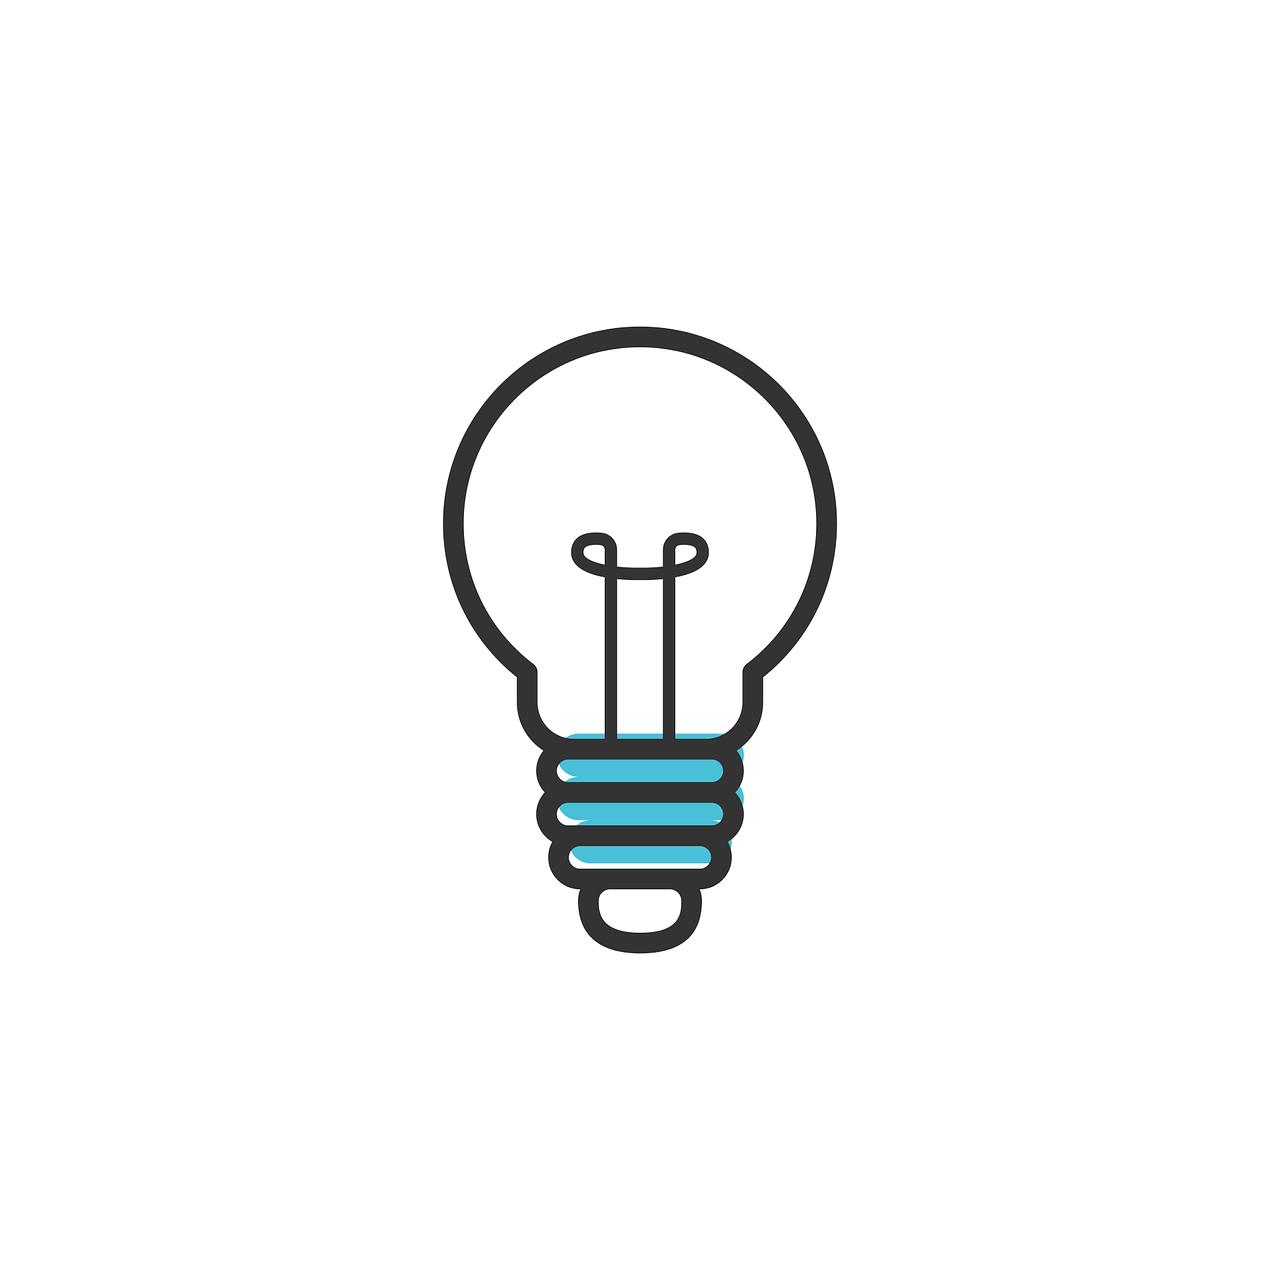 idea, icon, light